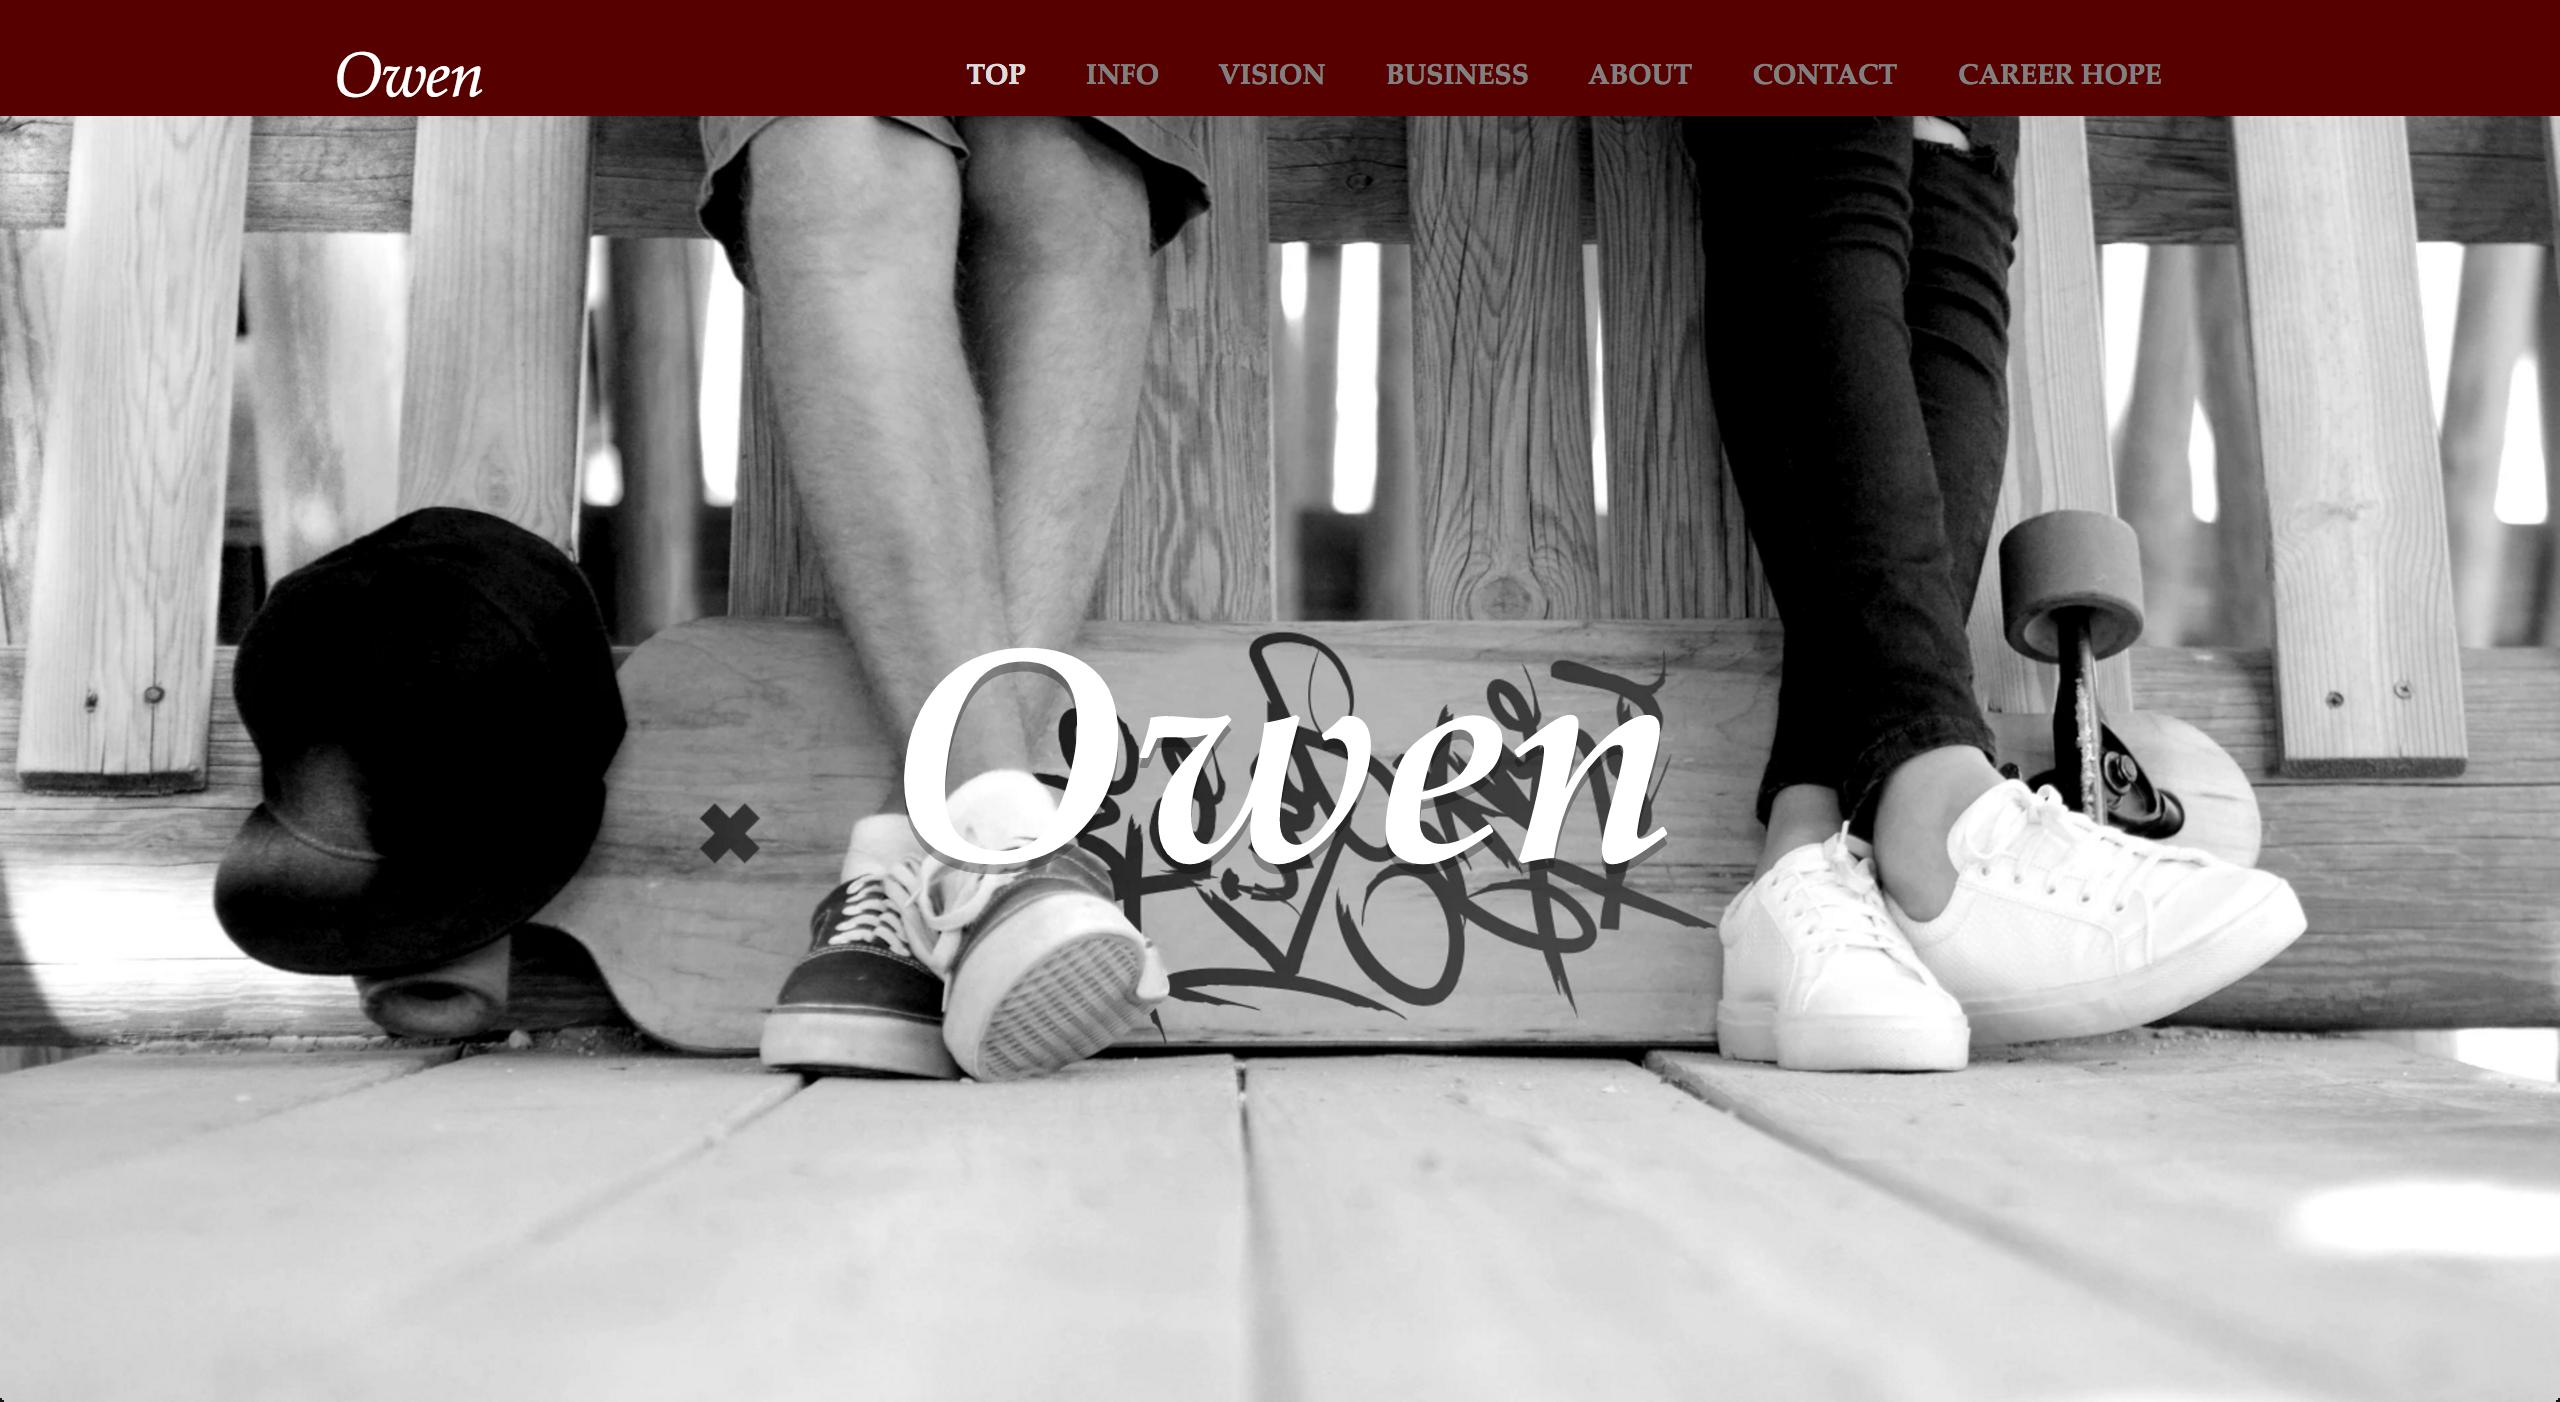 Owen株式会社